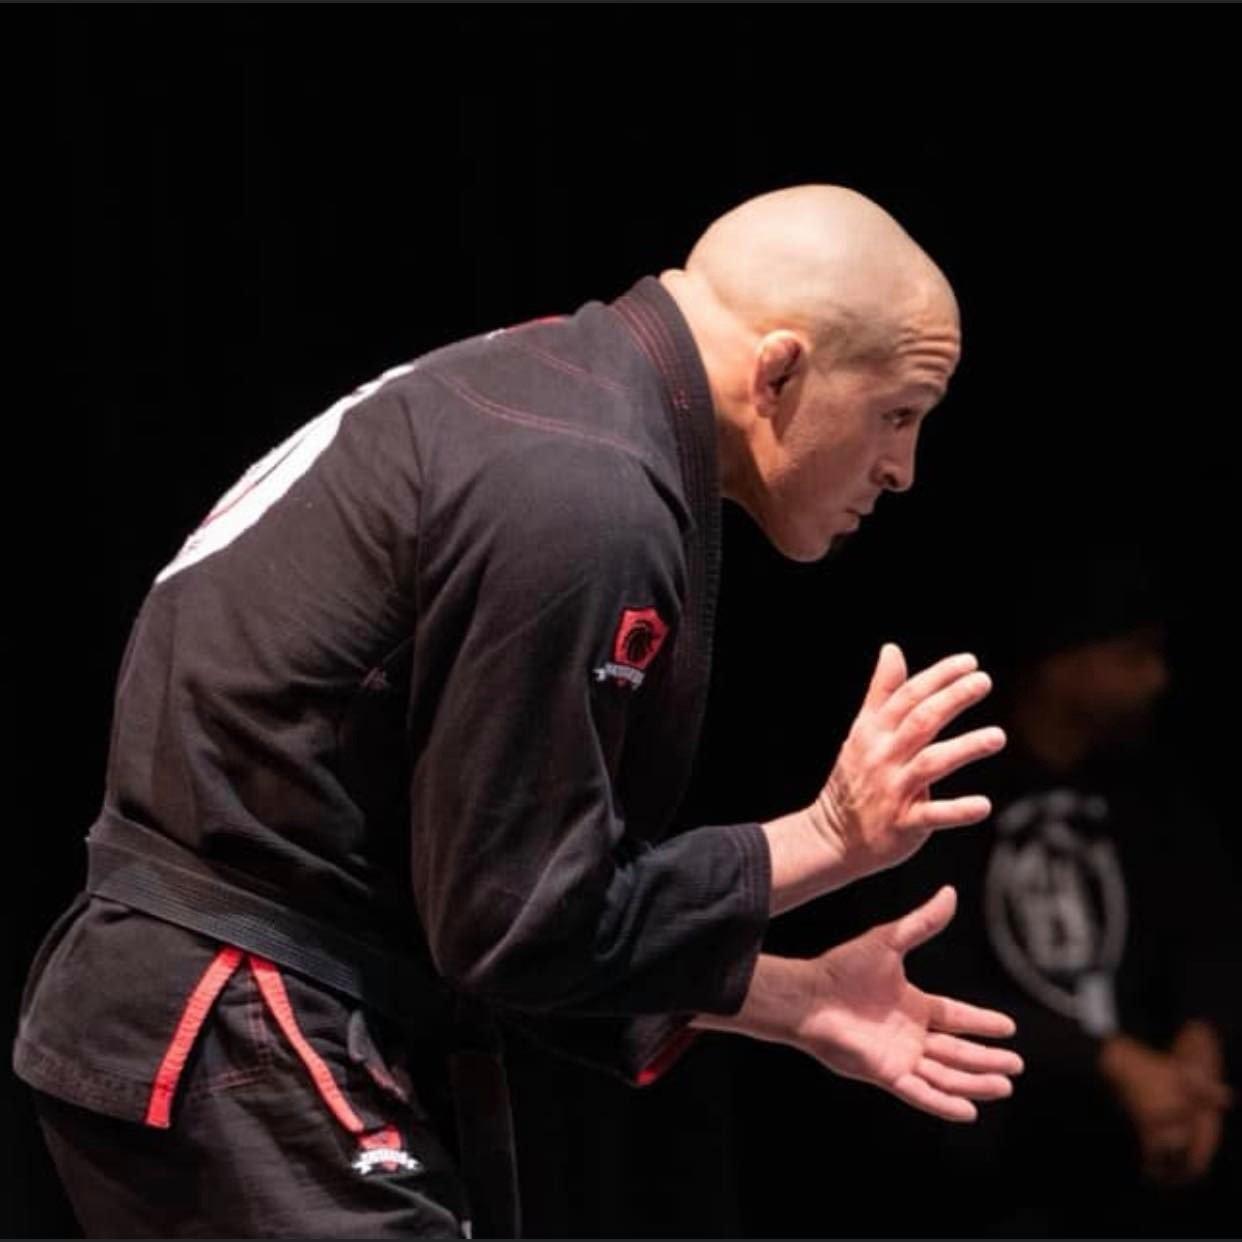 Manny Ray Gonzales Defund Racist Jiu Jitsu